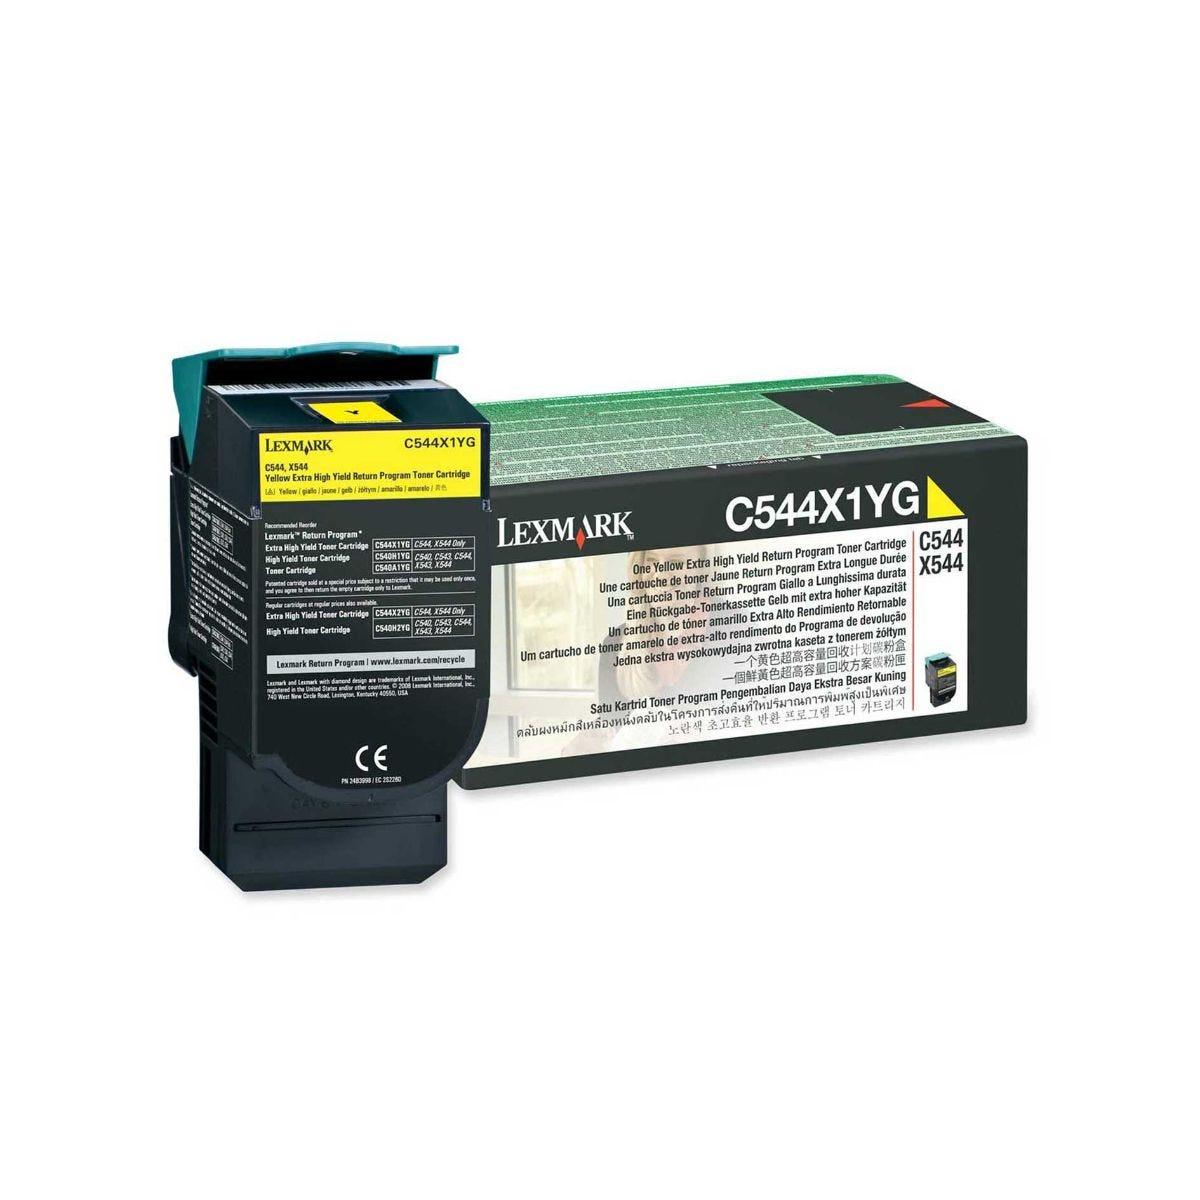 Image of Lexmark C544X1YG Toner Cartridge Extra High Yield, Yellow